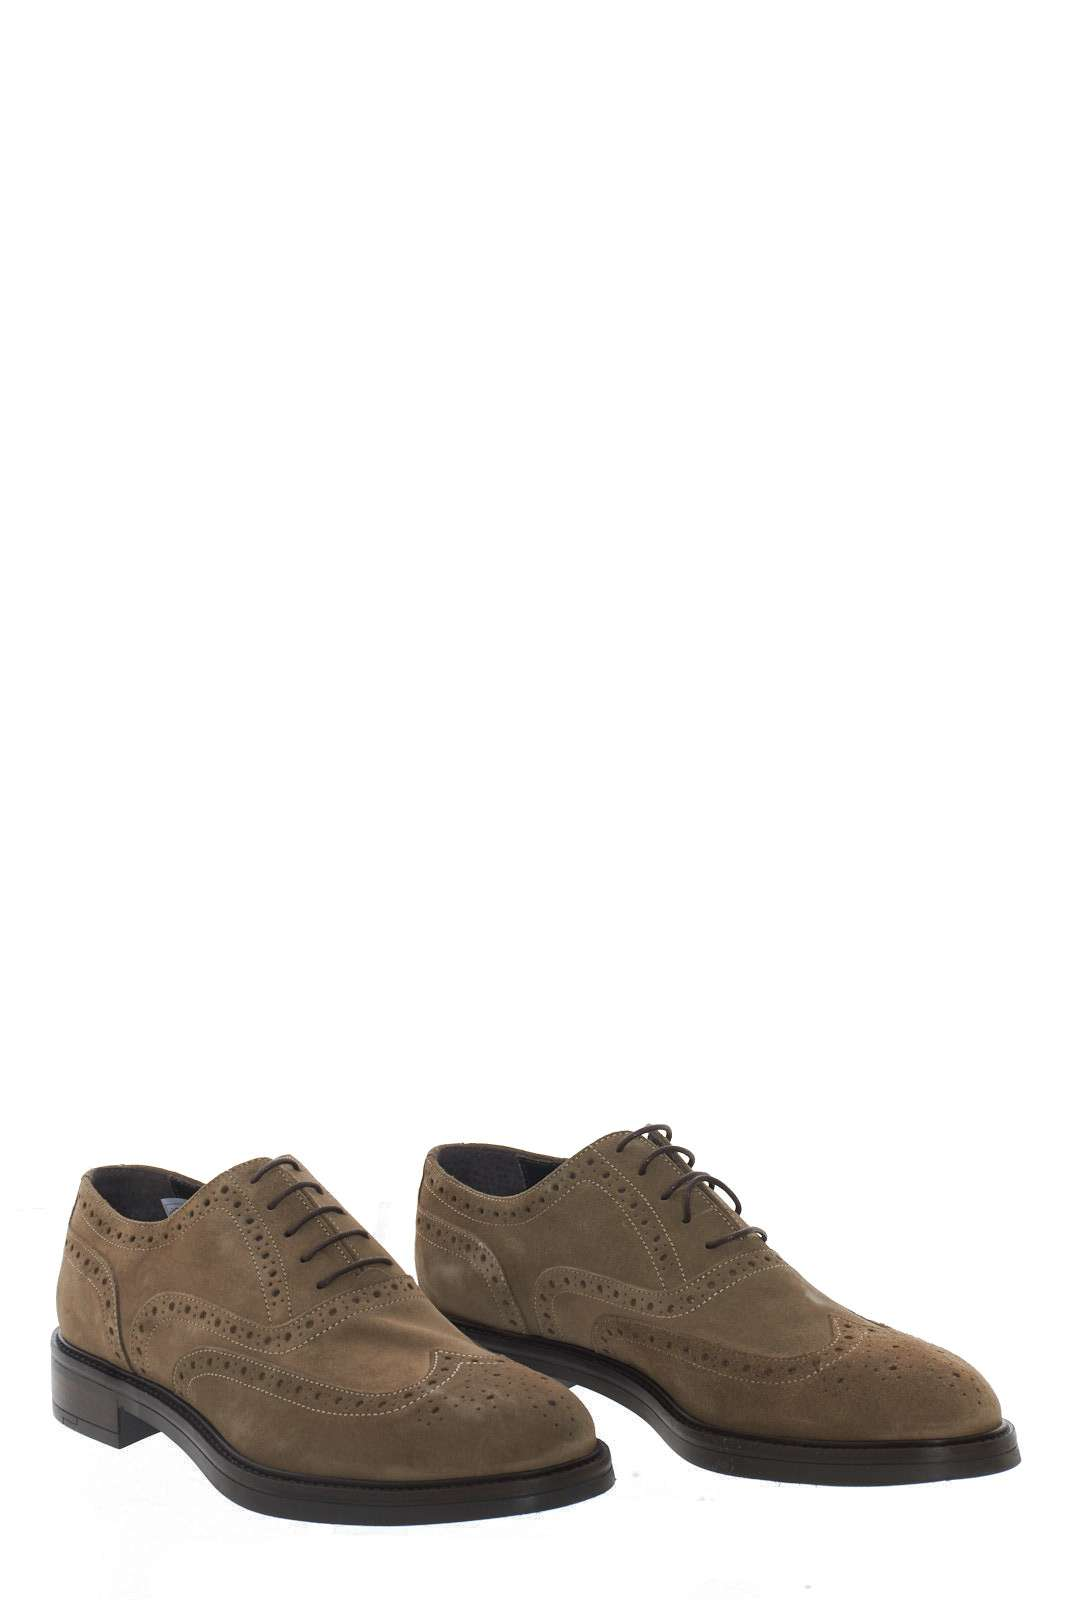 https://www.parmax.com/media/catalog/product/a/i/AI-outlet_parmax-scarpe-uomo-Libero%20Fashion-7582-A.jpg